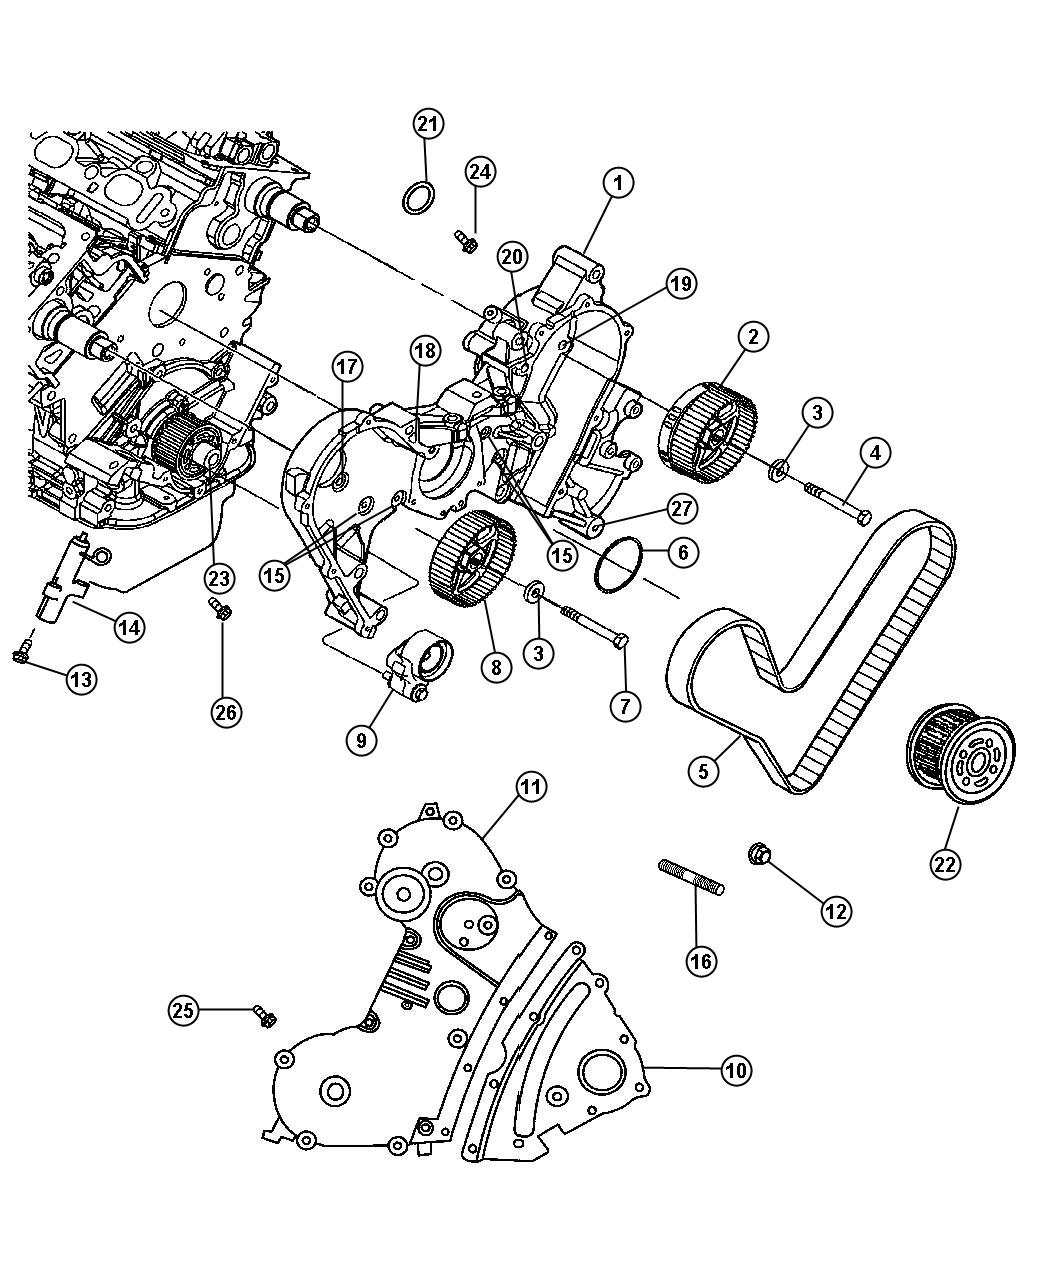 2005 Chrysler Pacifica Timing Belt Diagram Image Details Fuse Box 2006 Cover